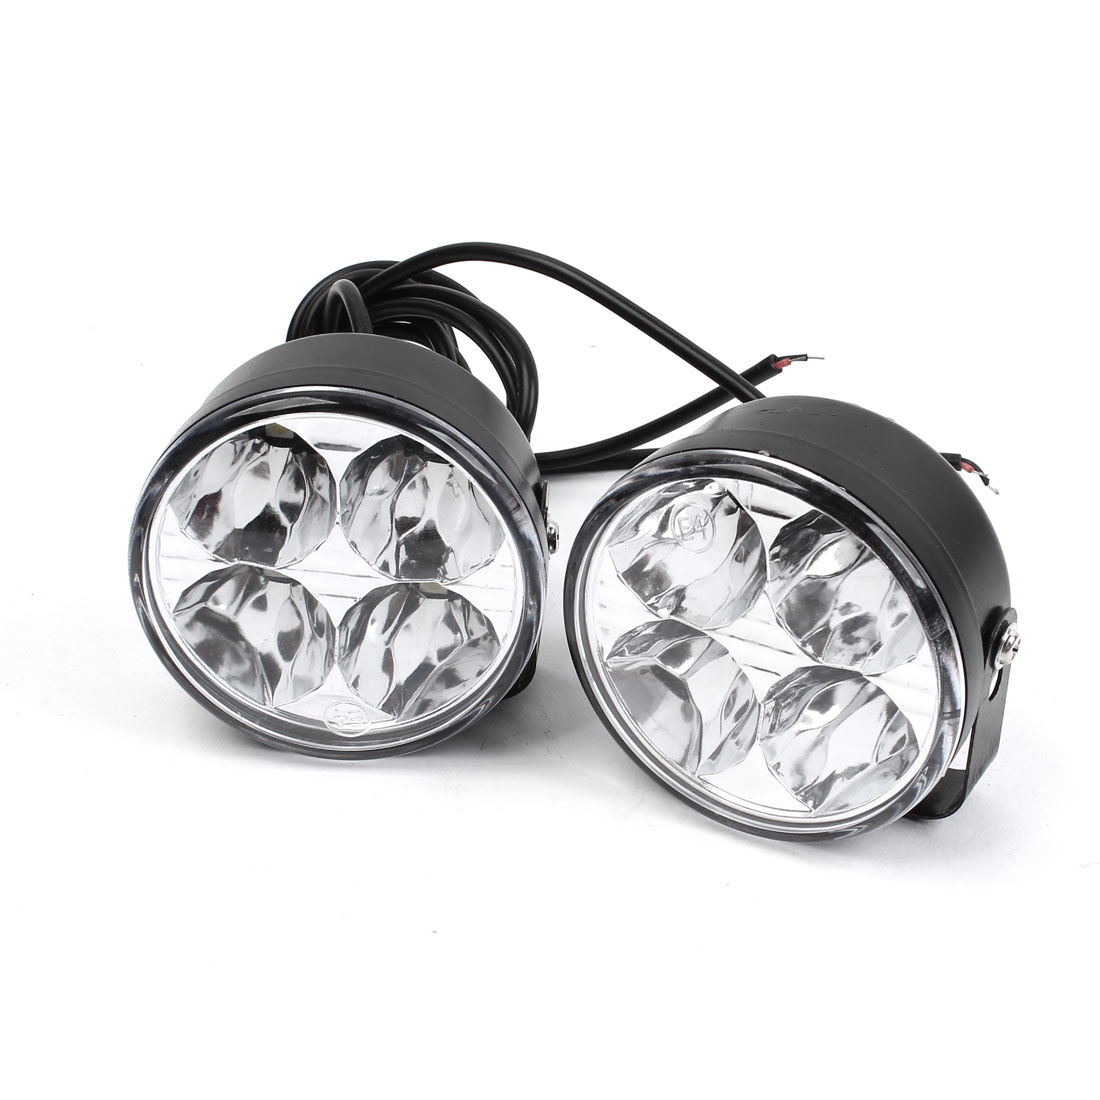 Pair Round Shape 4 LED White Car DRL Daytime Running Light Driving Lamp